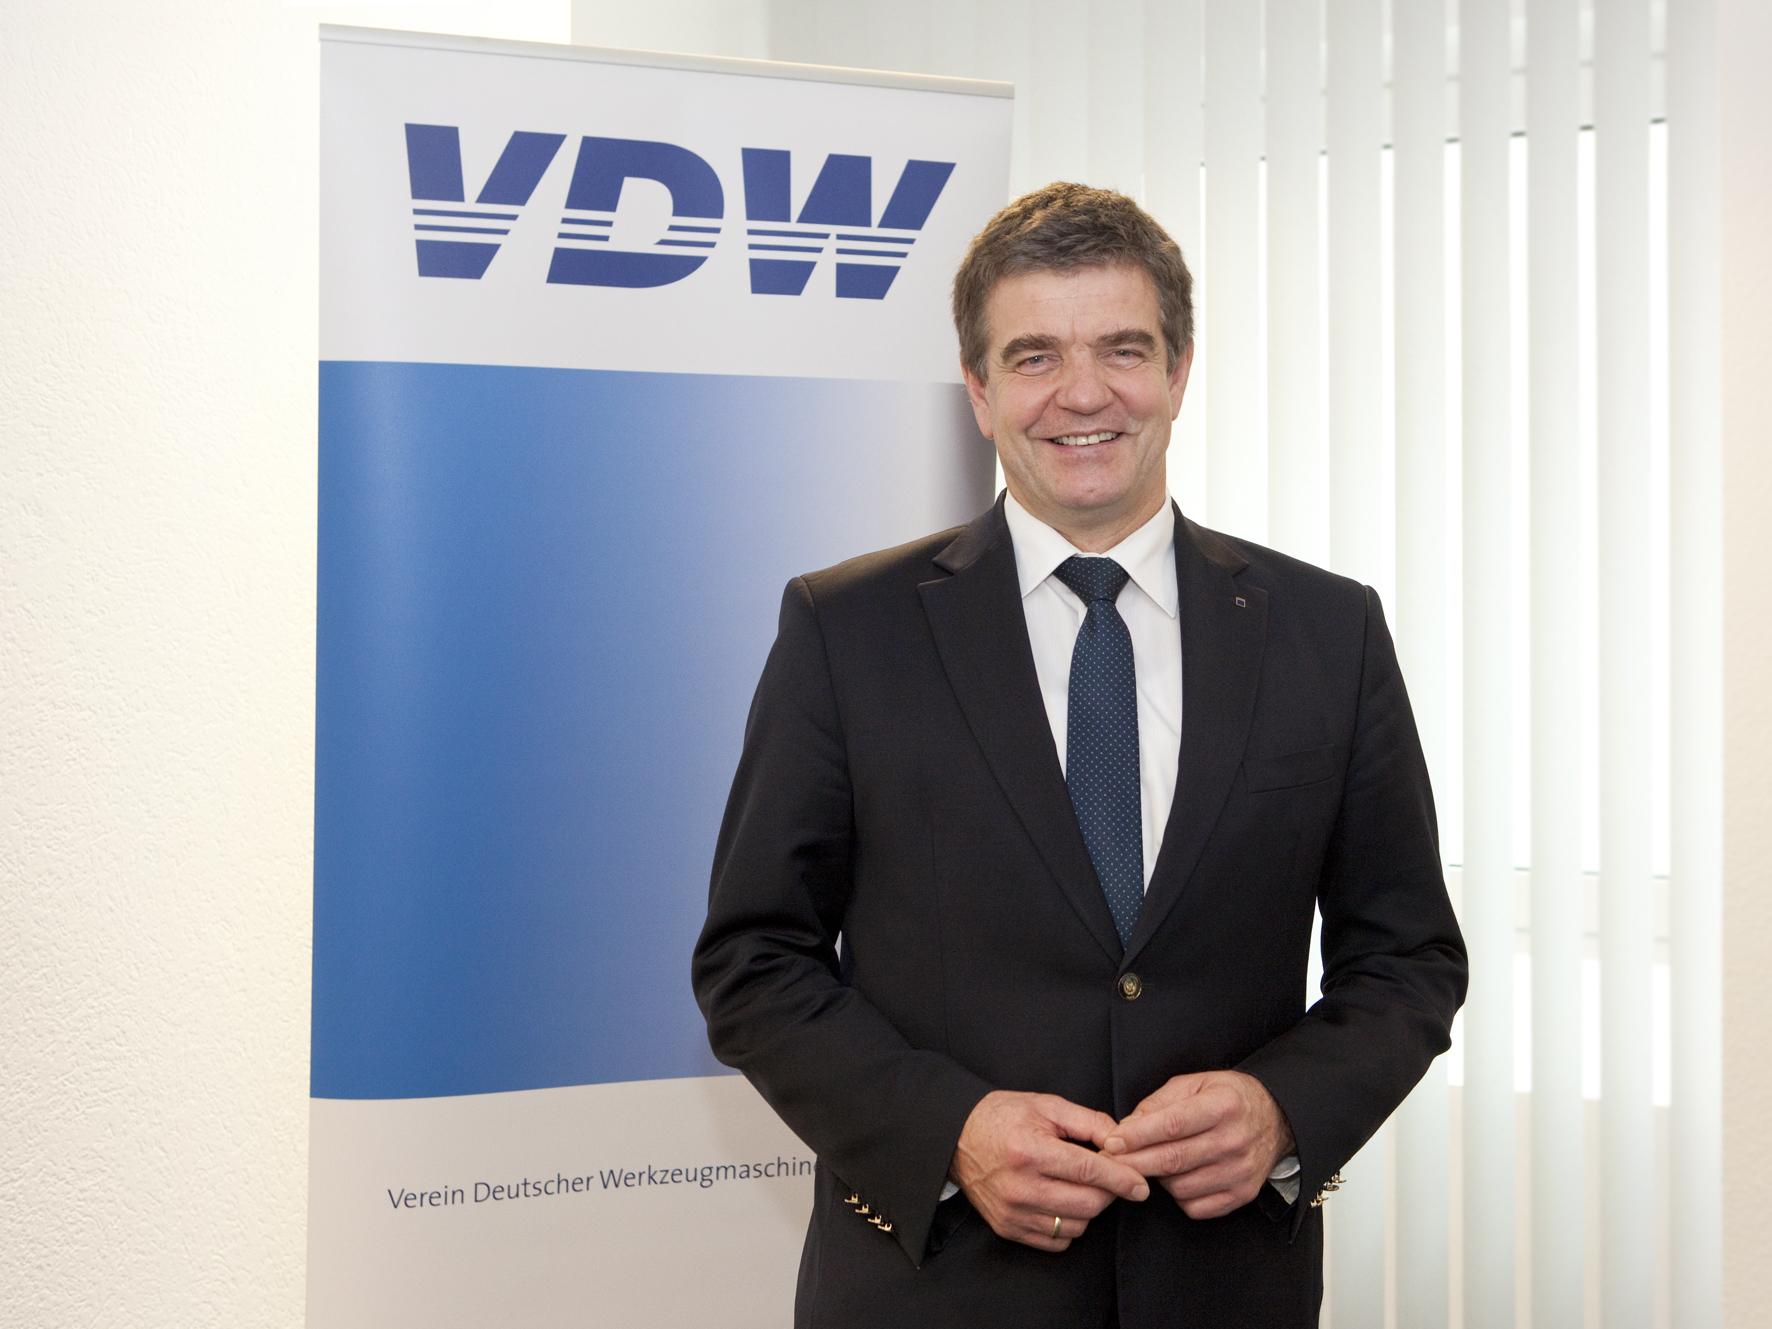 Dr. Heinz-Jürgen Prokop, Chairman VDW